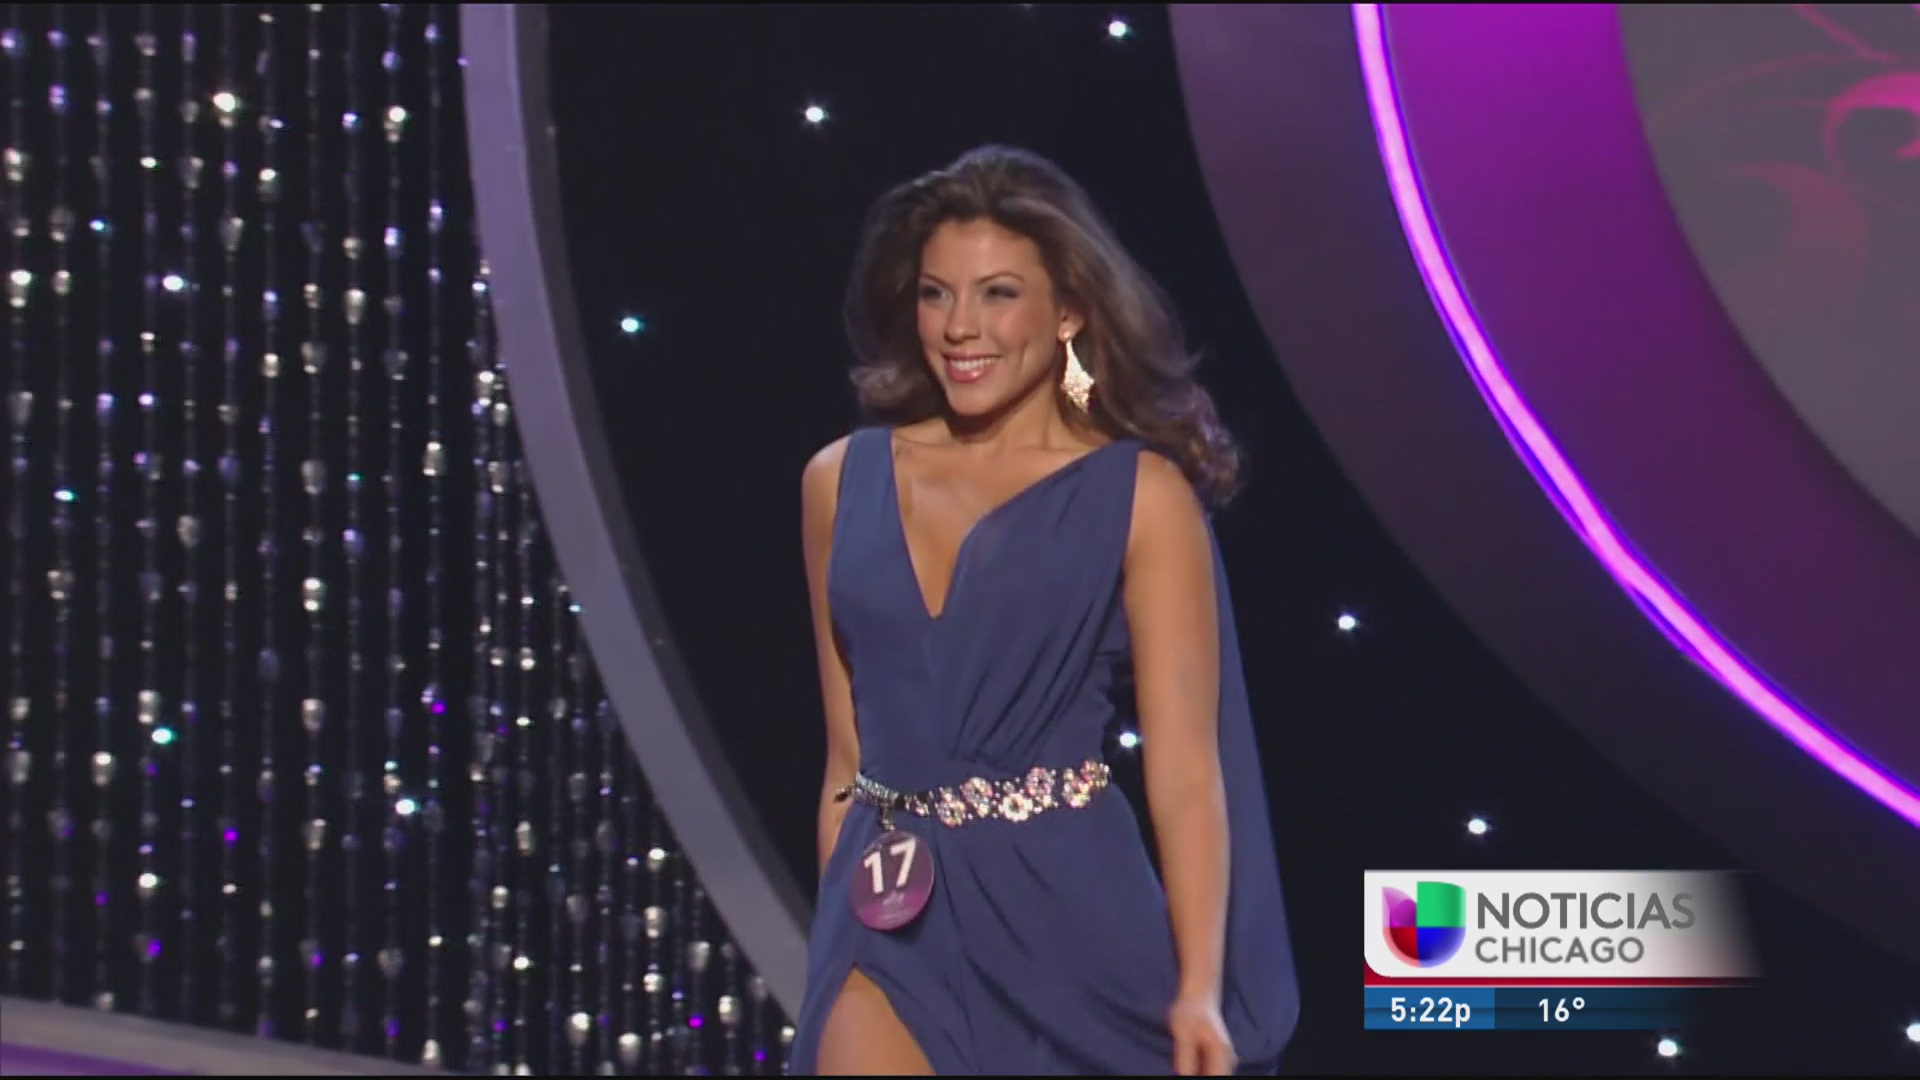 Nicole Suarez segunda nominada de Chicago para NBL VIP